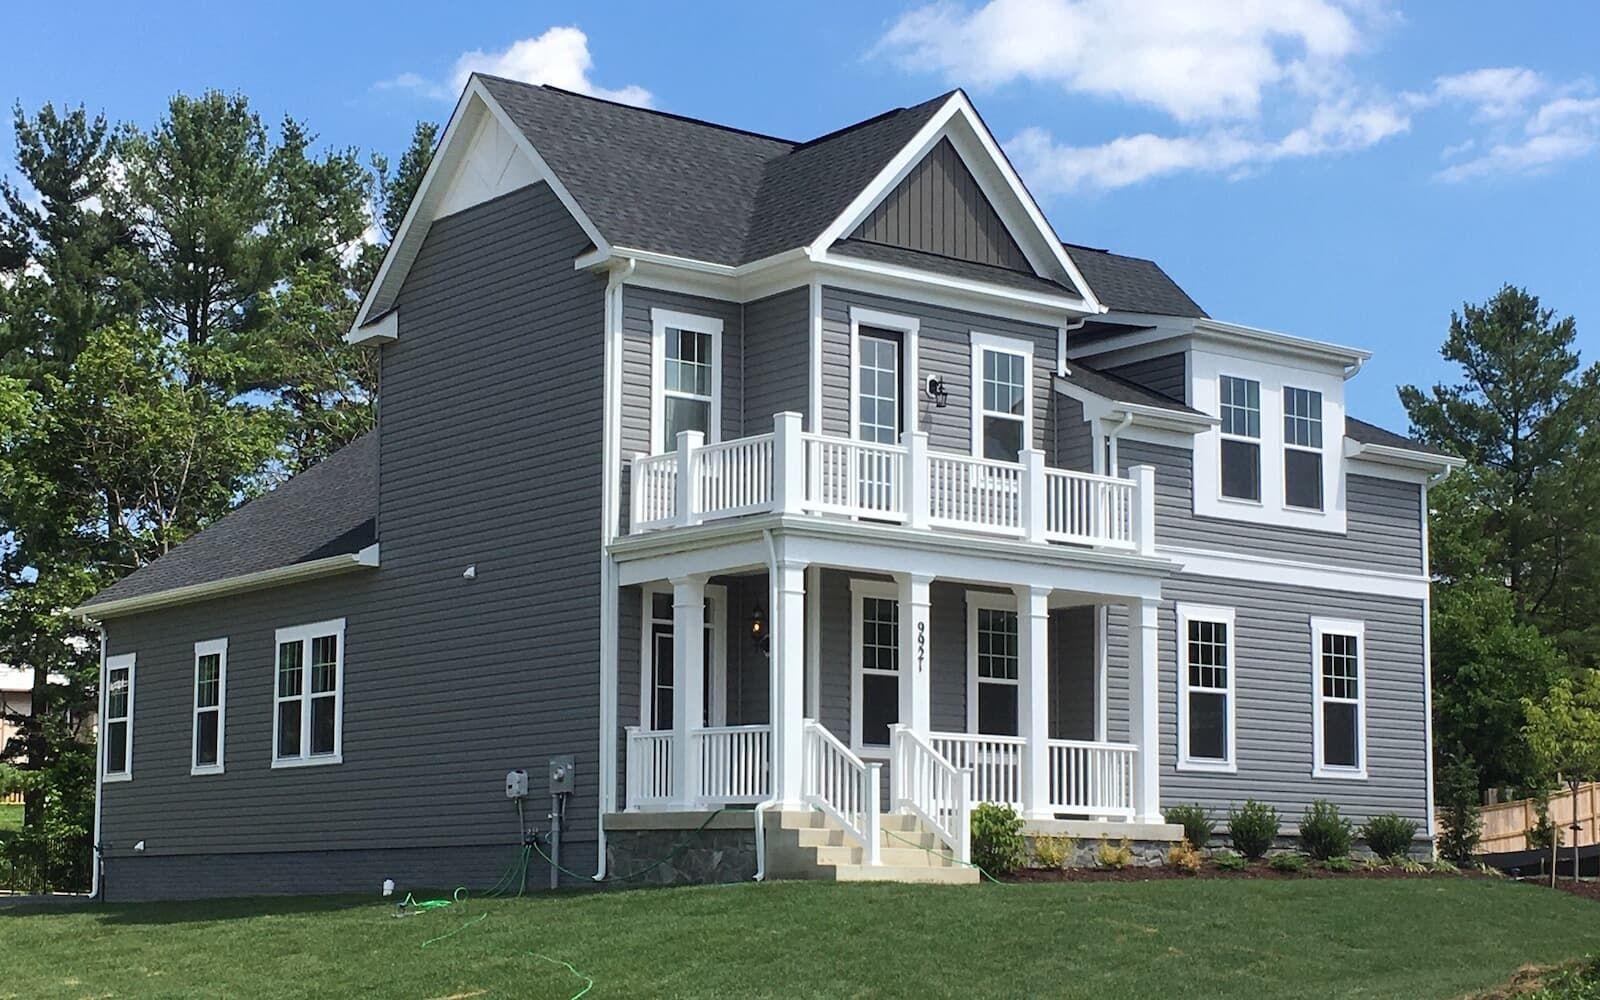 Exterior:exterior homesite 1006 ridgeview brookfield residential